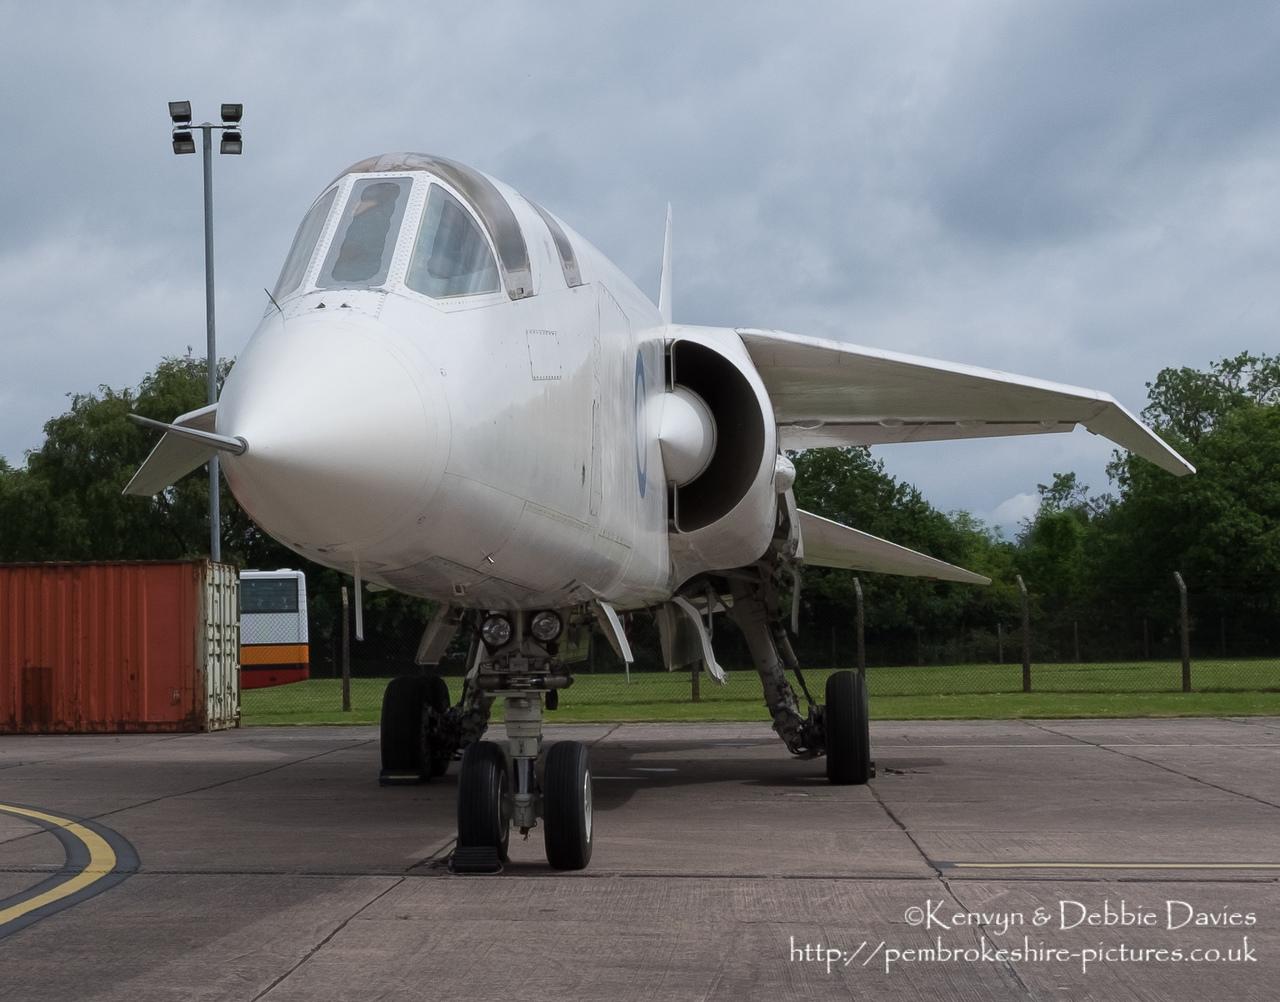 The British Aircraft Corporation Tsr 2